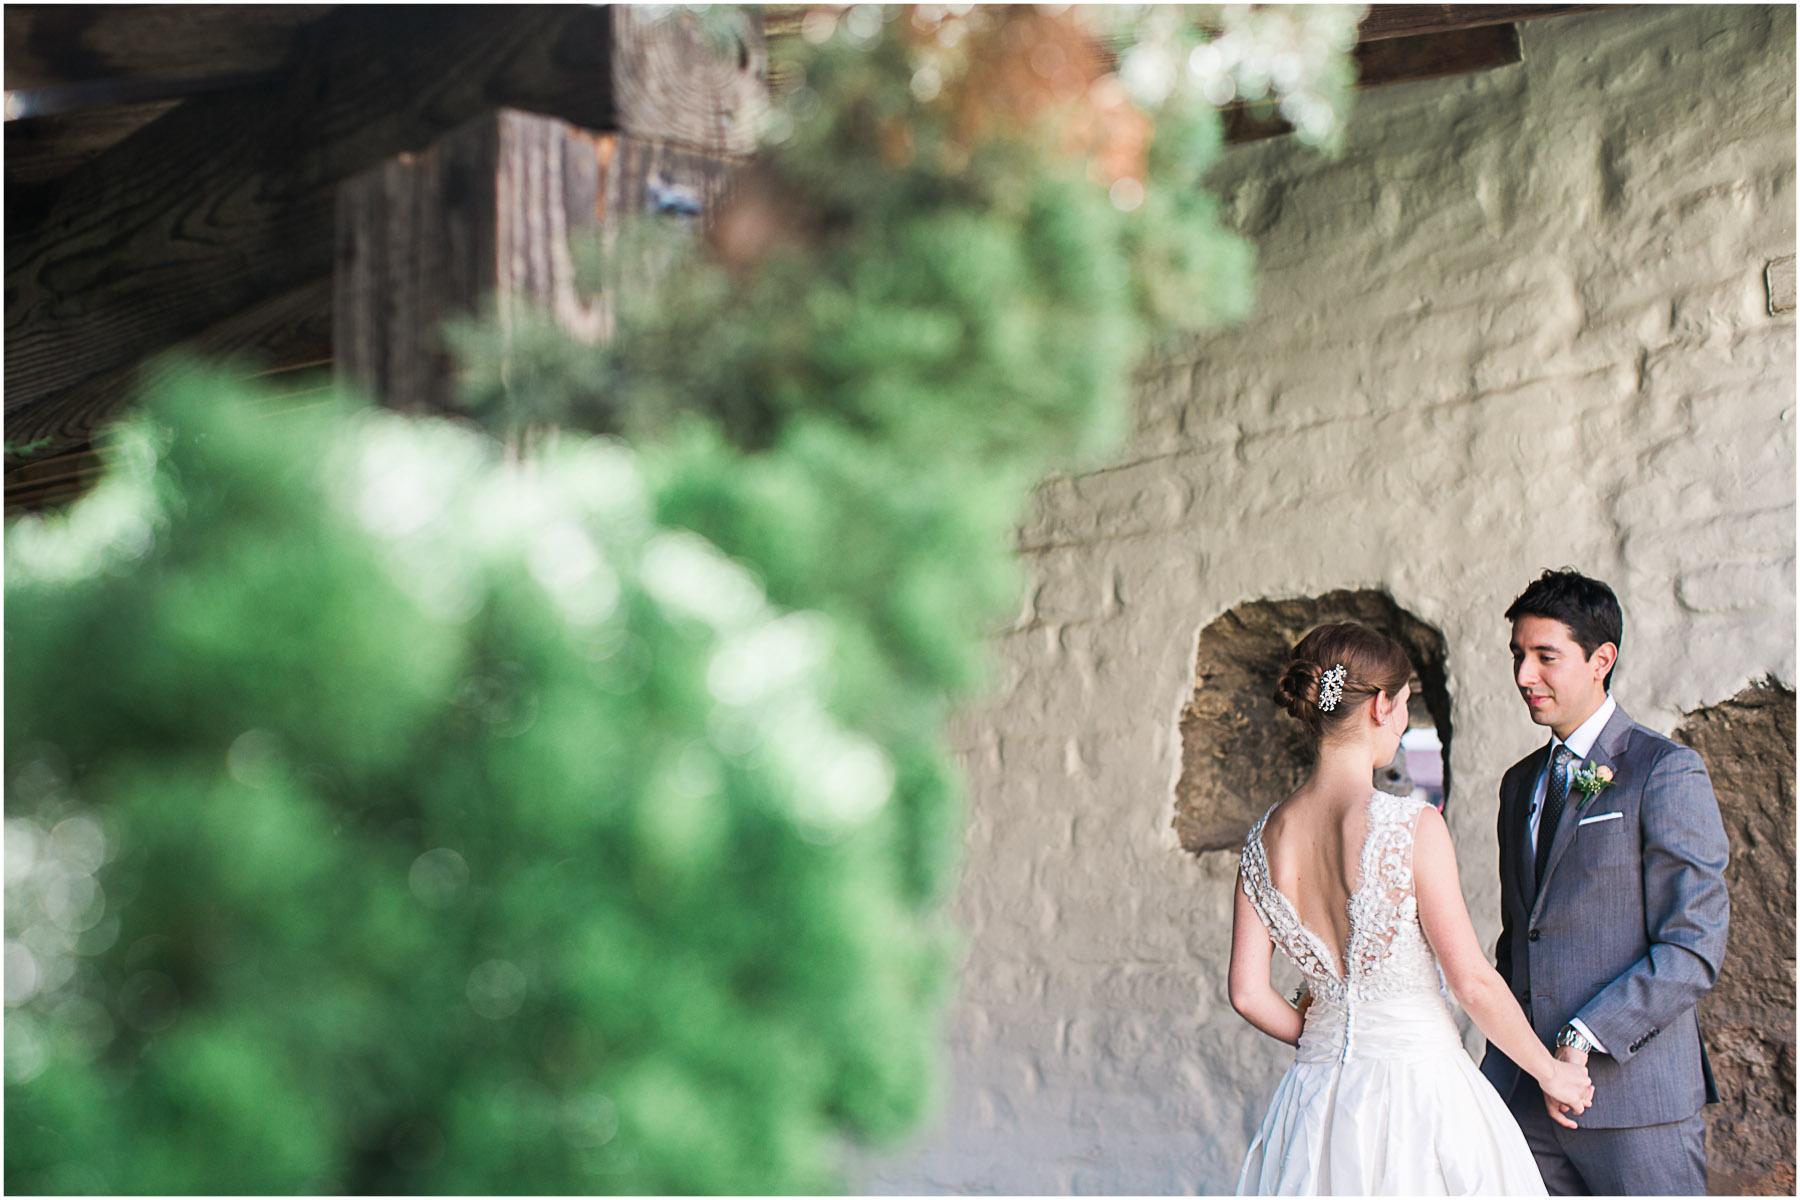 JennaBethPhotography-LJWedding-12.jpg